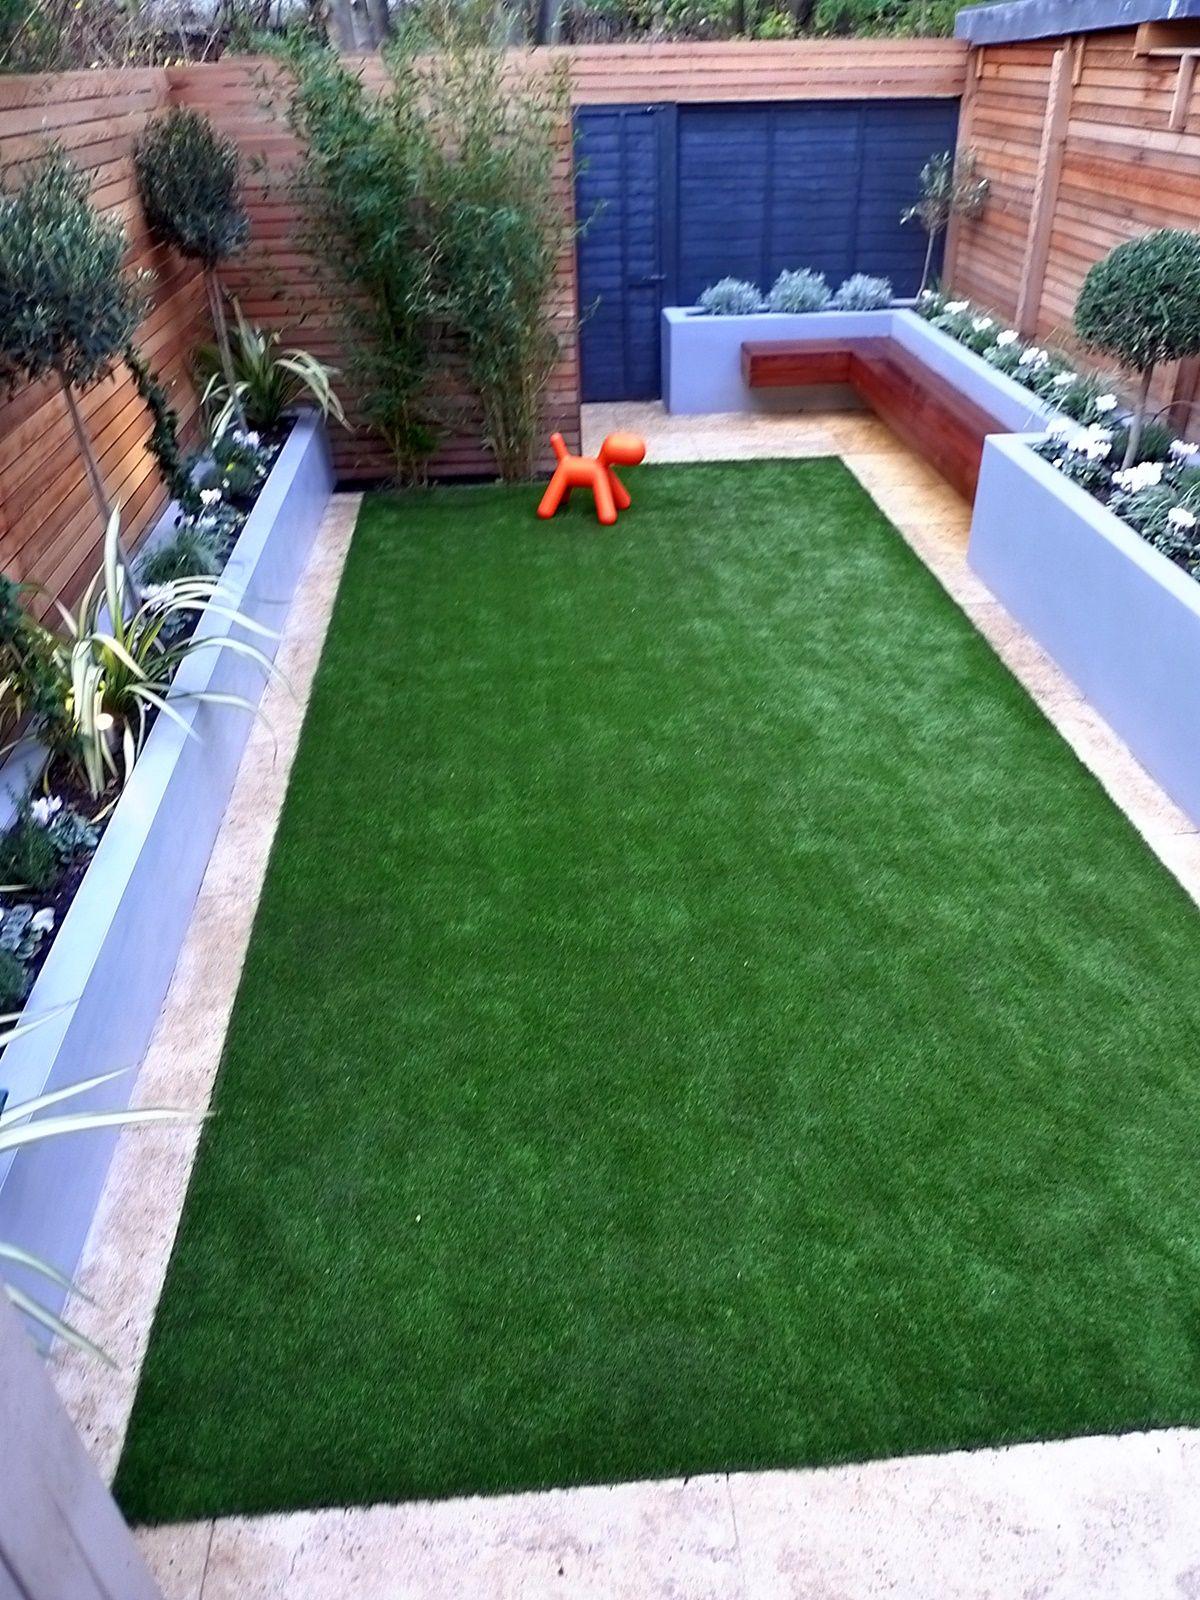 Share Tweet Pin Mail Garden Designer Modern Style London Contact Anewgarden For More Inform Modern Garden Design Contemporary Garden Design Small Garden Design